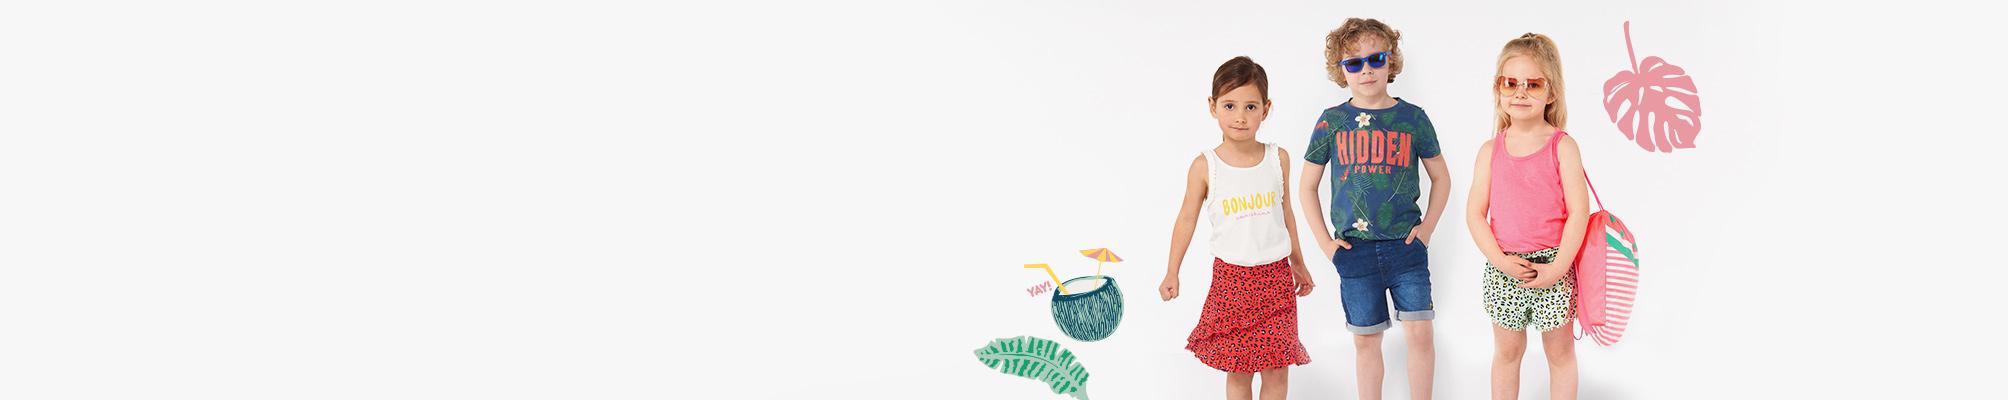 Kinderkleding Maat 74.Kinderkleding Grote Collectie Hema